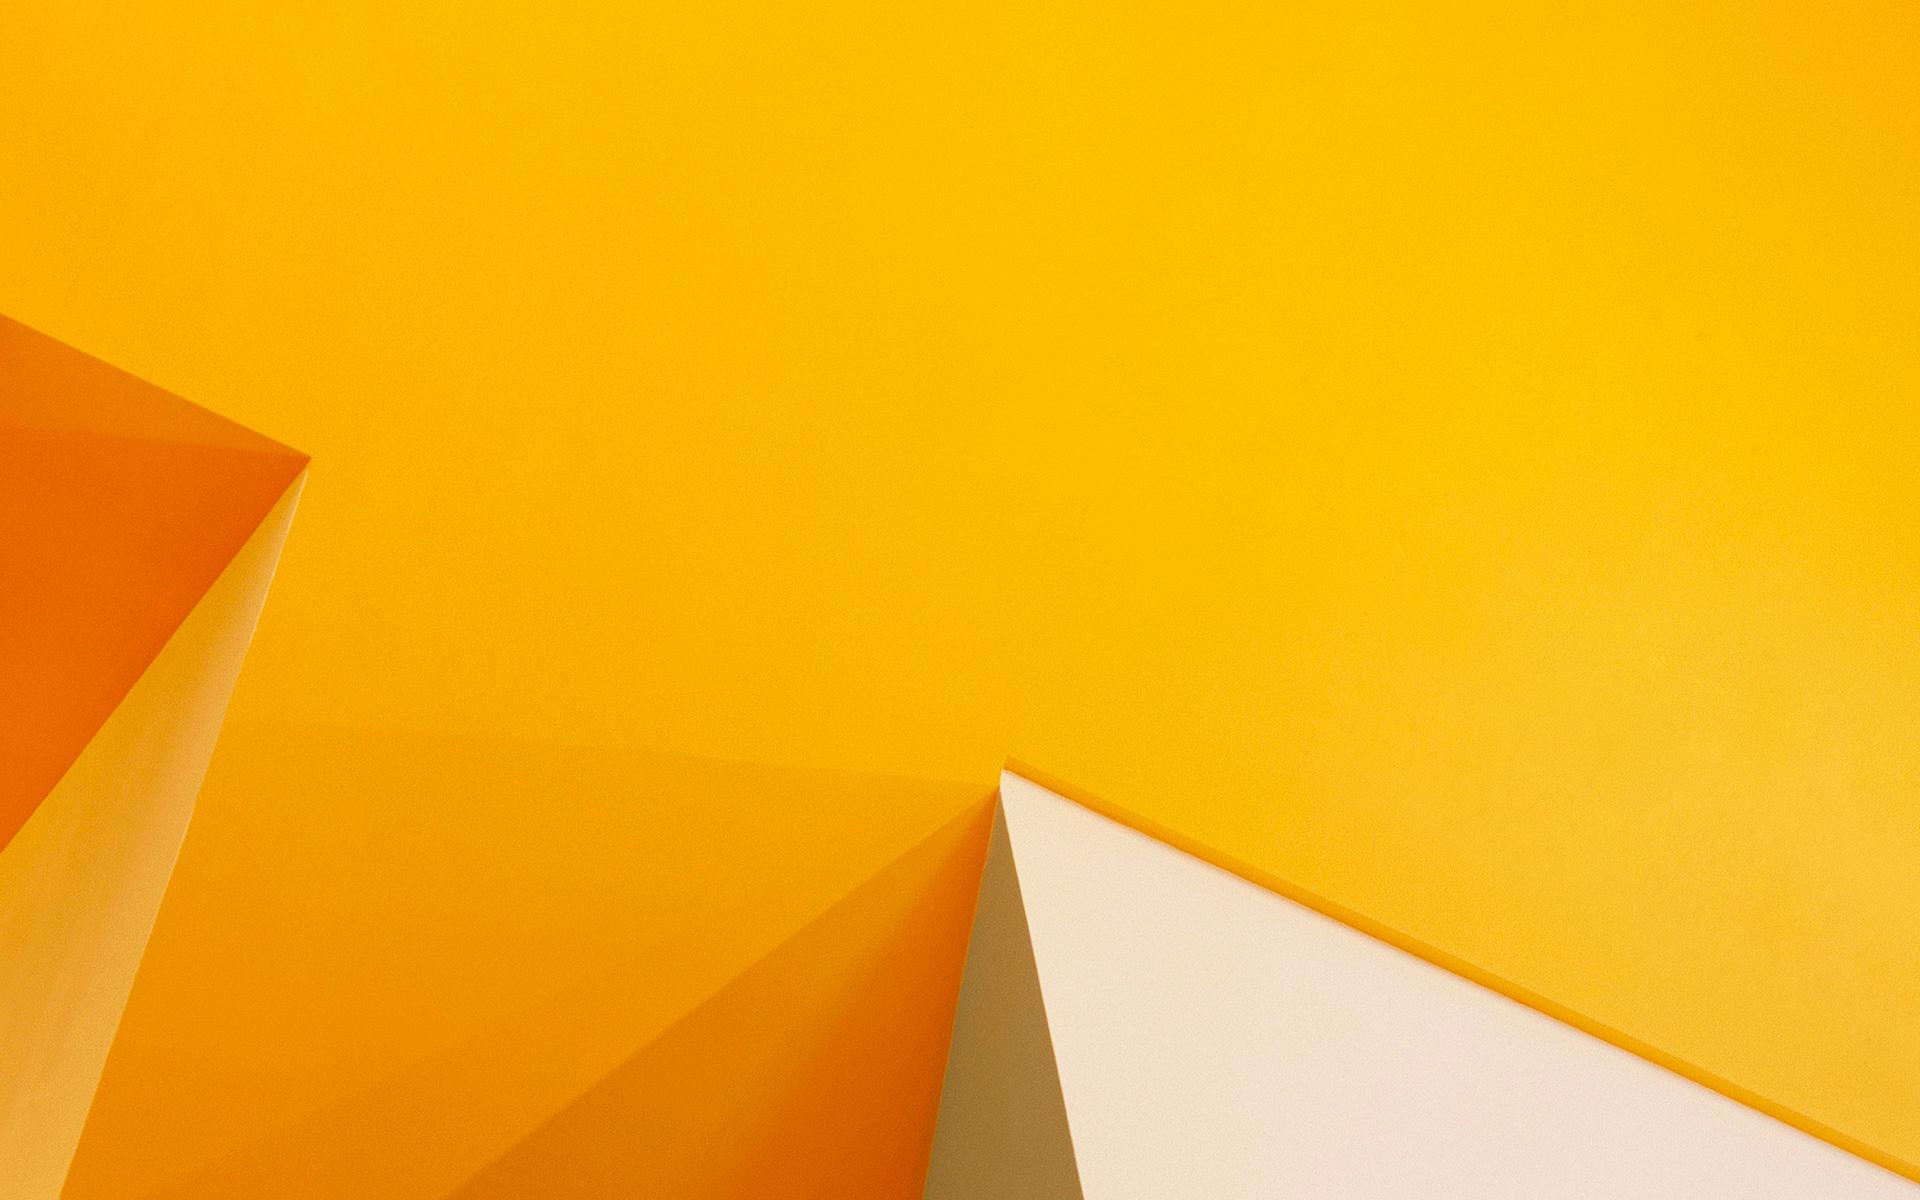 Windows 10 Original Wallpaper: Windows 10 Original Wallpaper